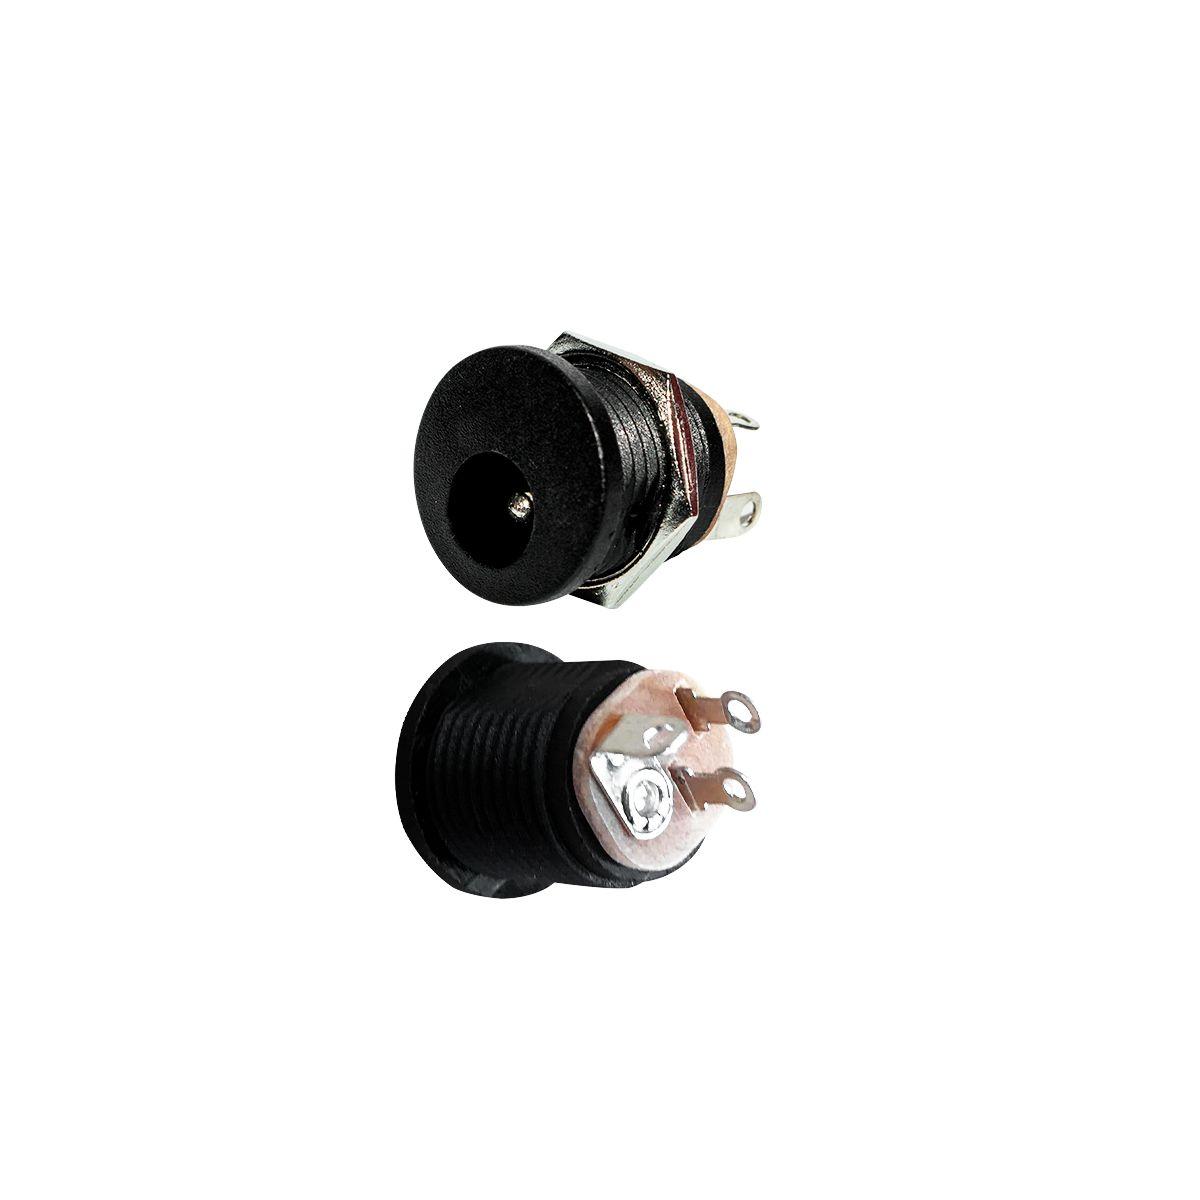 Kit 30 Unidades Conector Plug De Energia P4 Macho + 30 Unidades Plug Jack Tipo P4 Fêmea Com Rosca